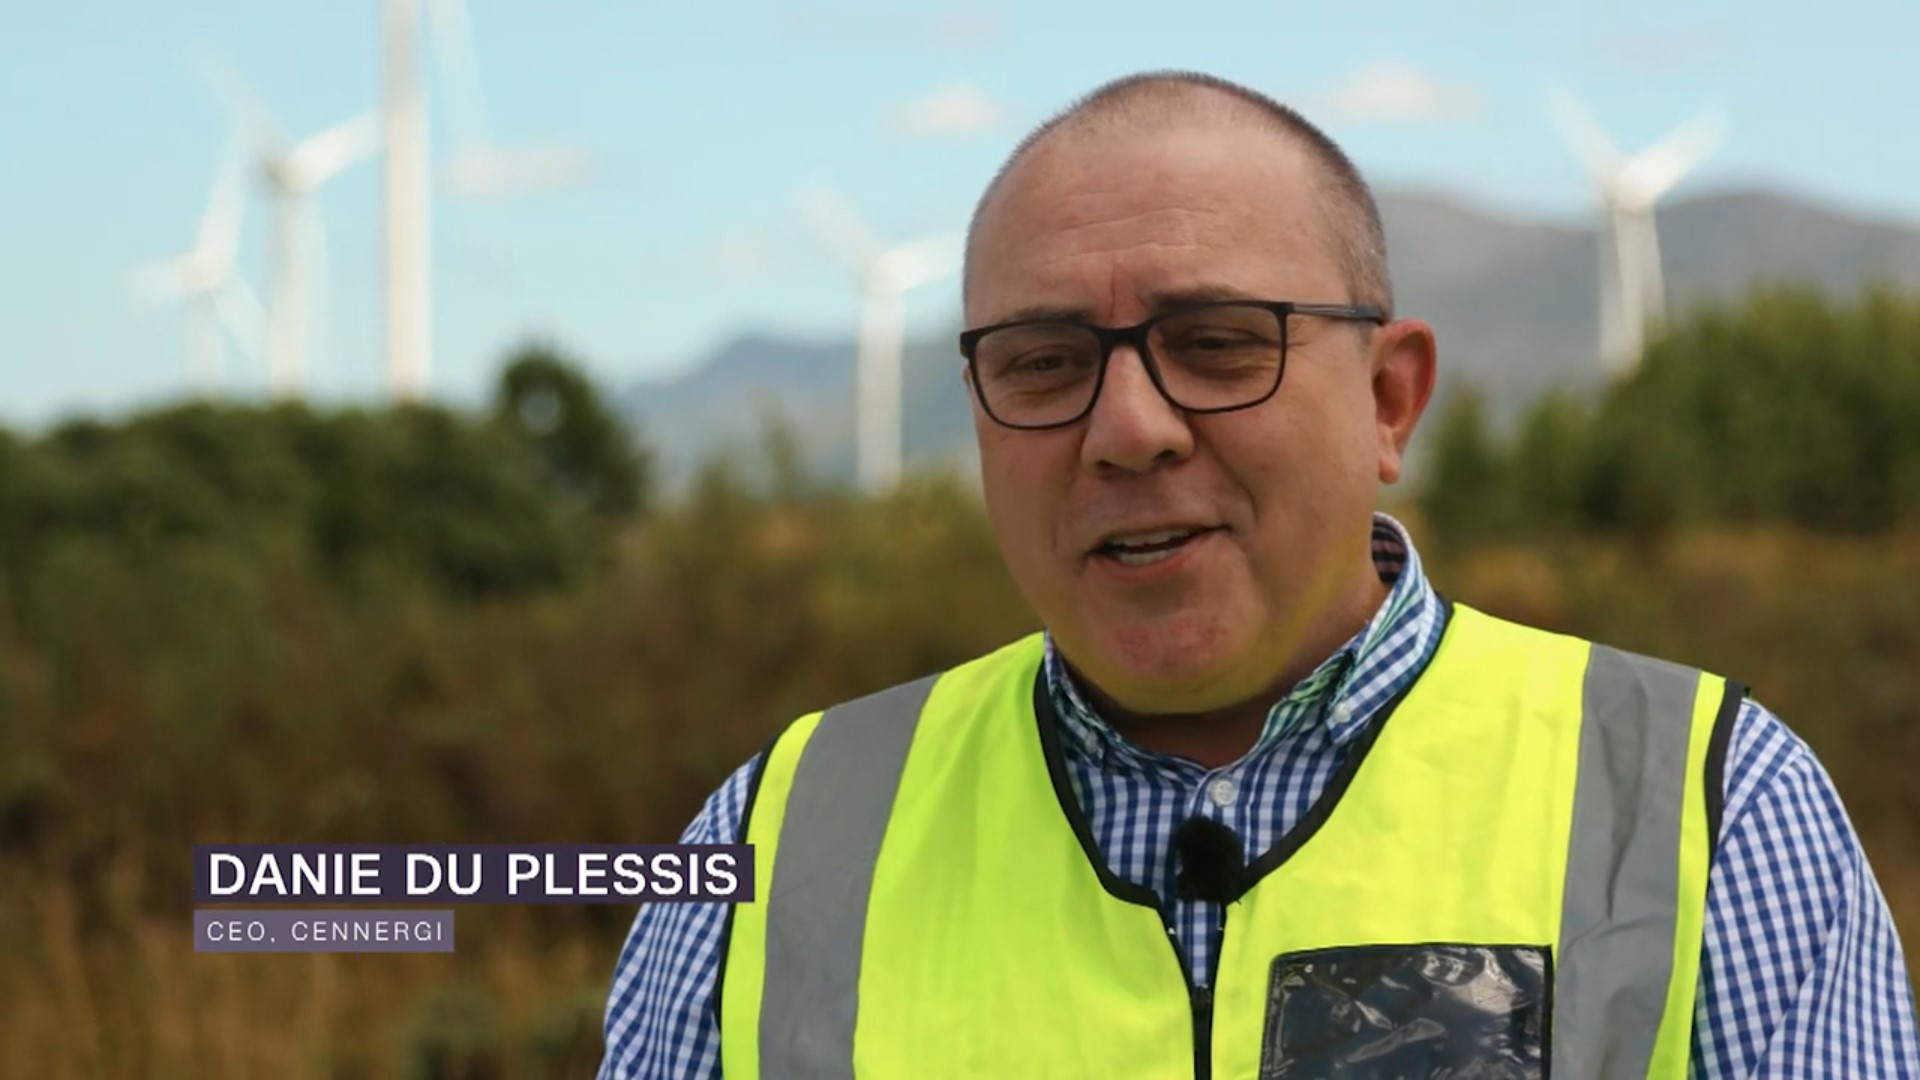 Danie Du Plessis on CNN's Connecting Africa-Brand Spur Nigeria